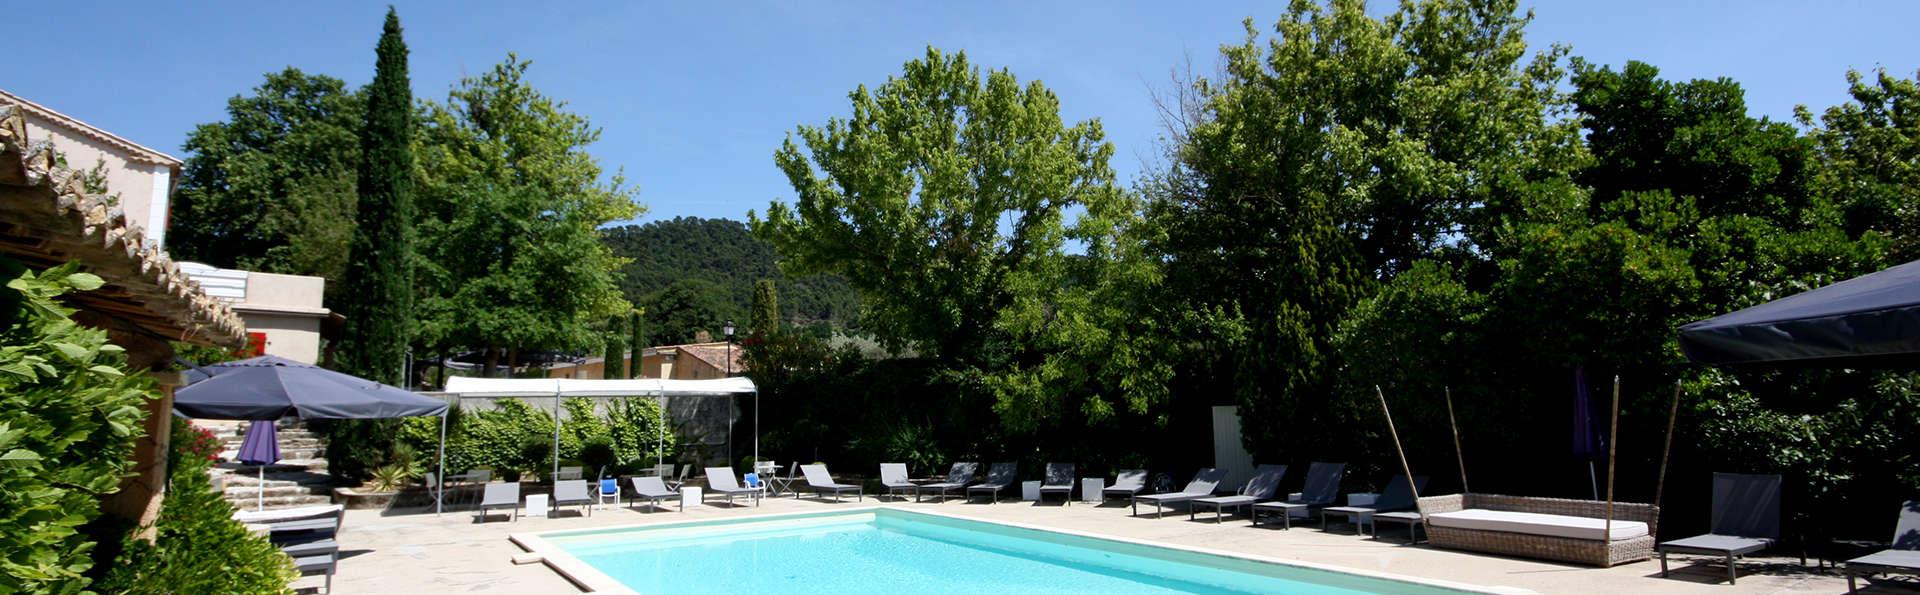 Hostellerie du Domaine de Cabasse - EDIT_pool2.jpg